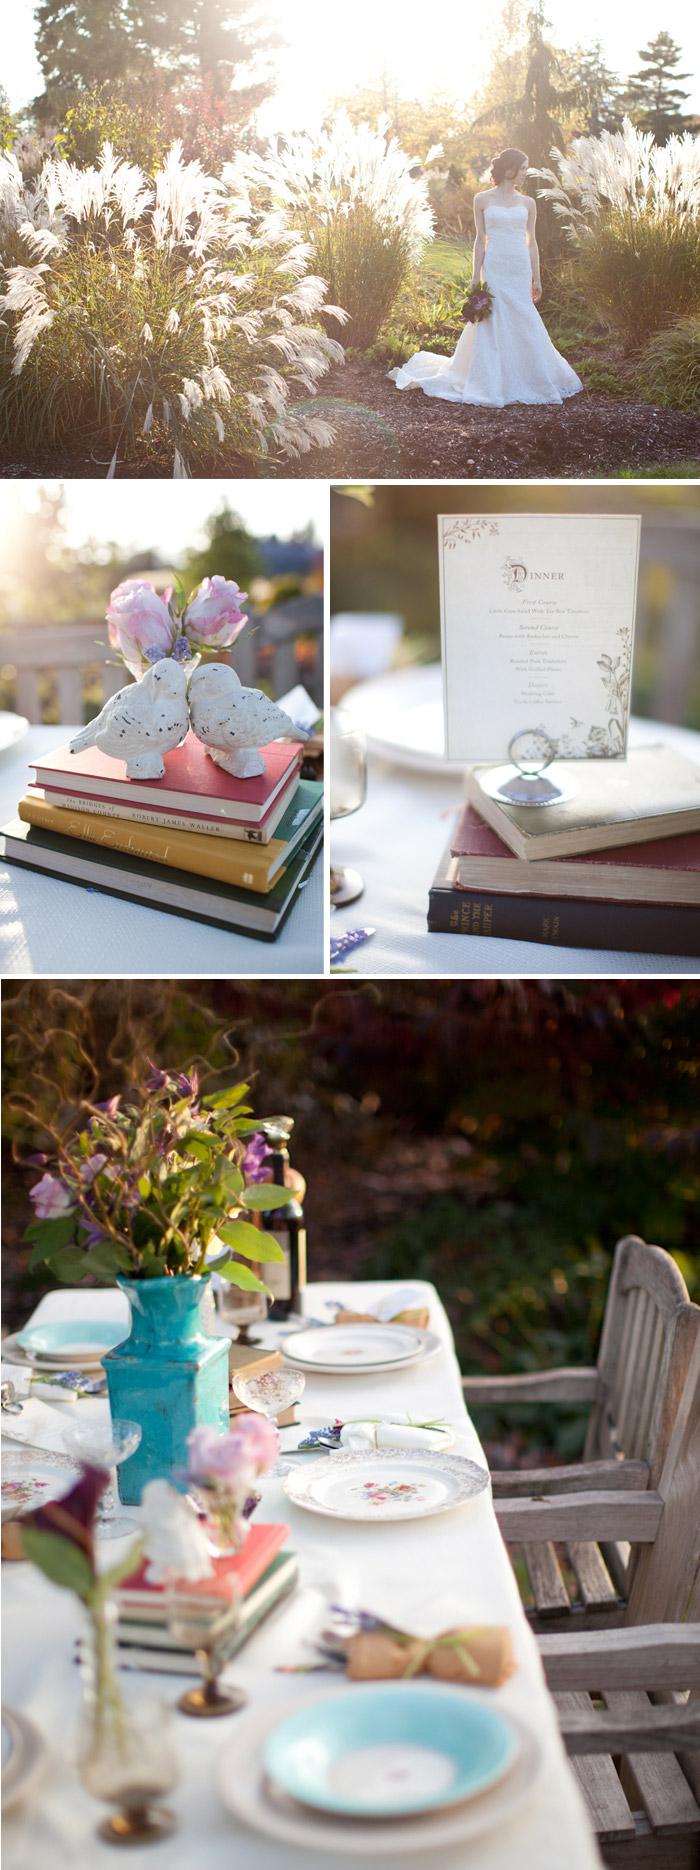 Storybook_Wedding_Invitation2.jpg